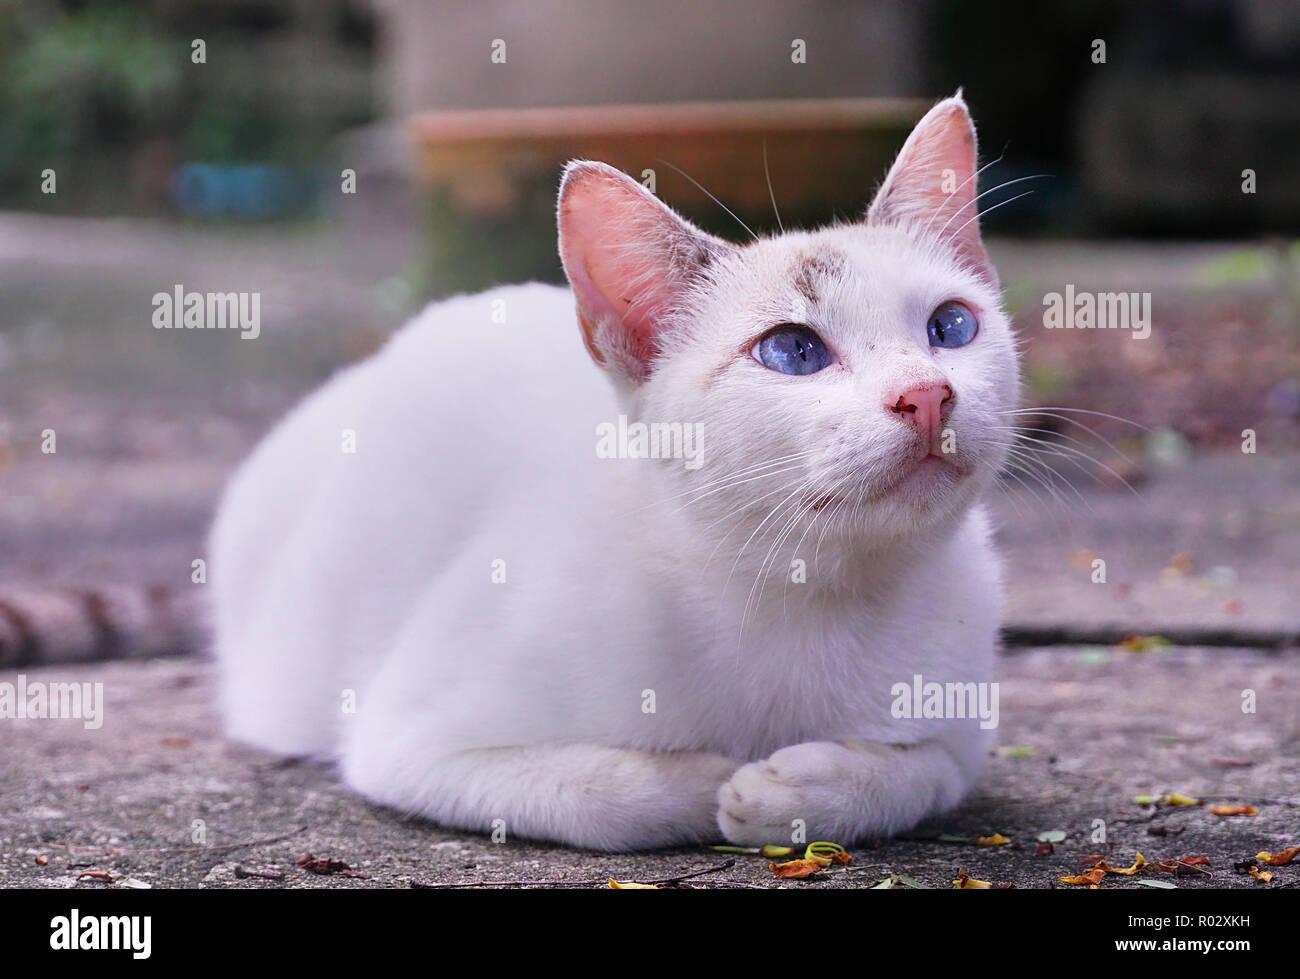 Portrait white cute kitten sit on ground - Stock Image